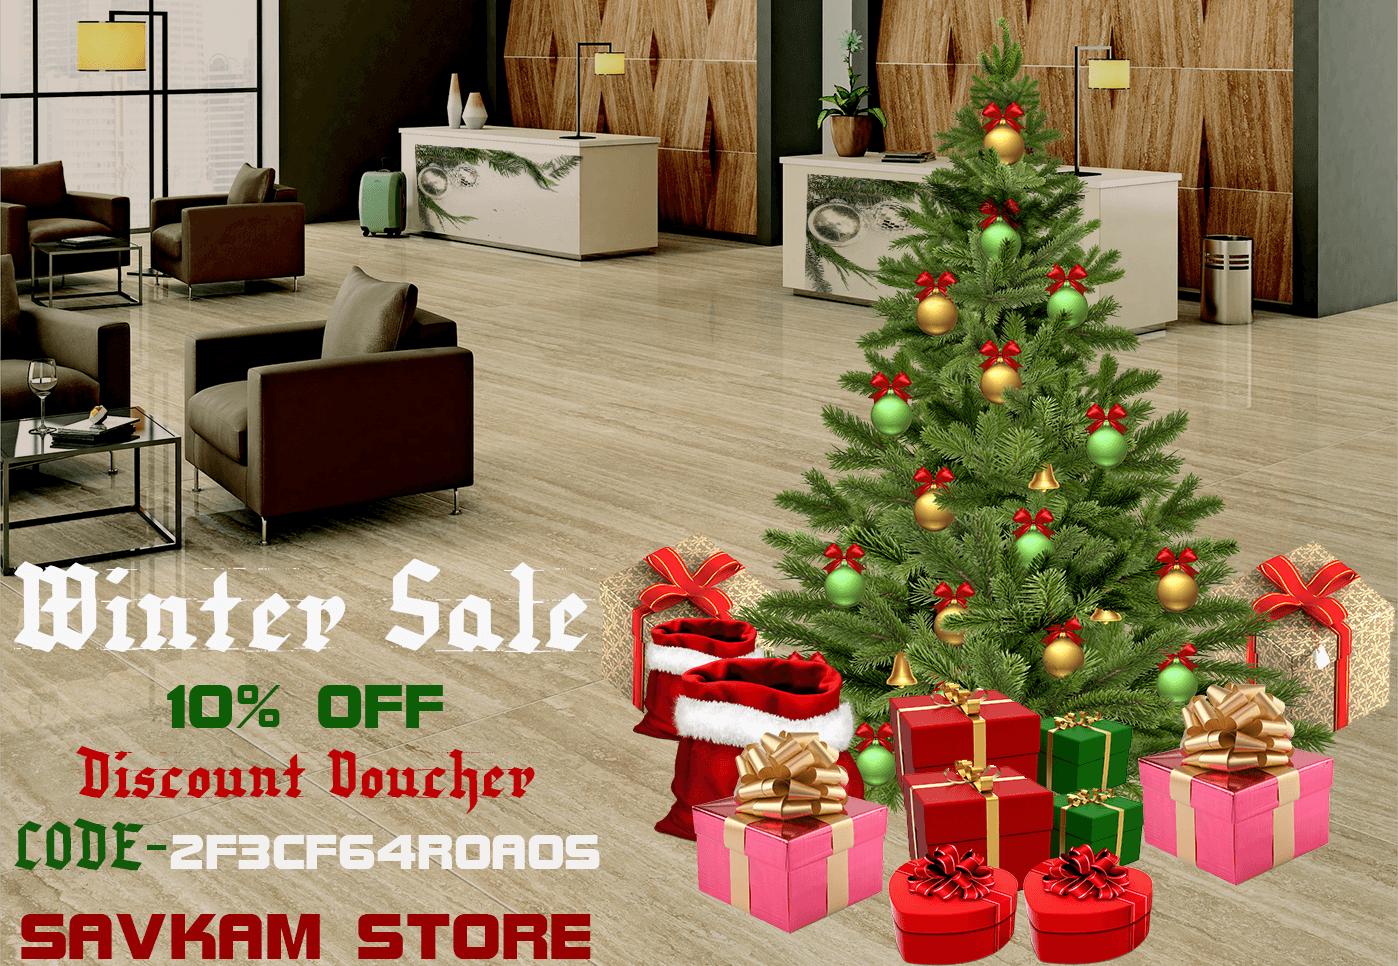 Savkam Store Discount Voucher